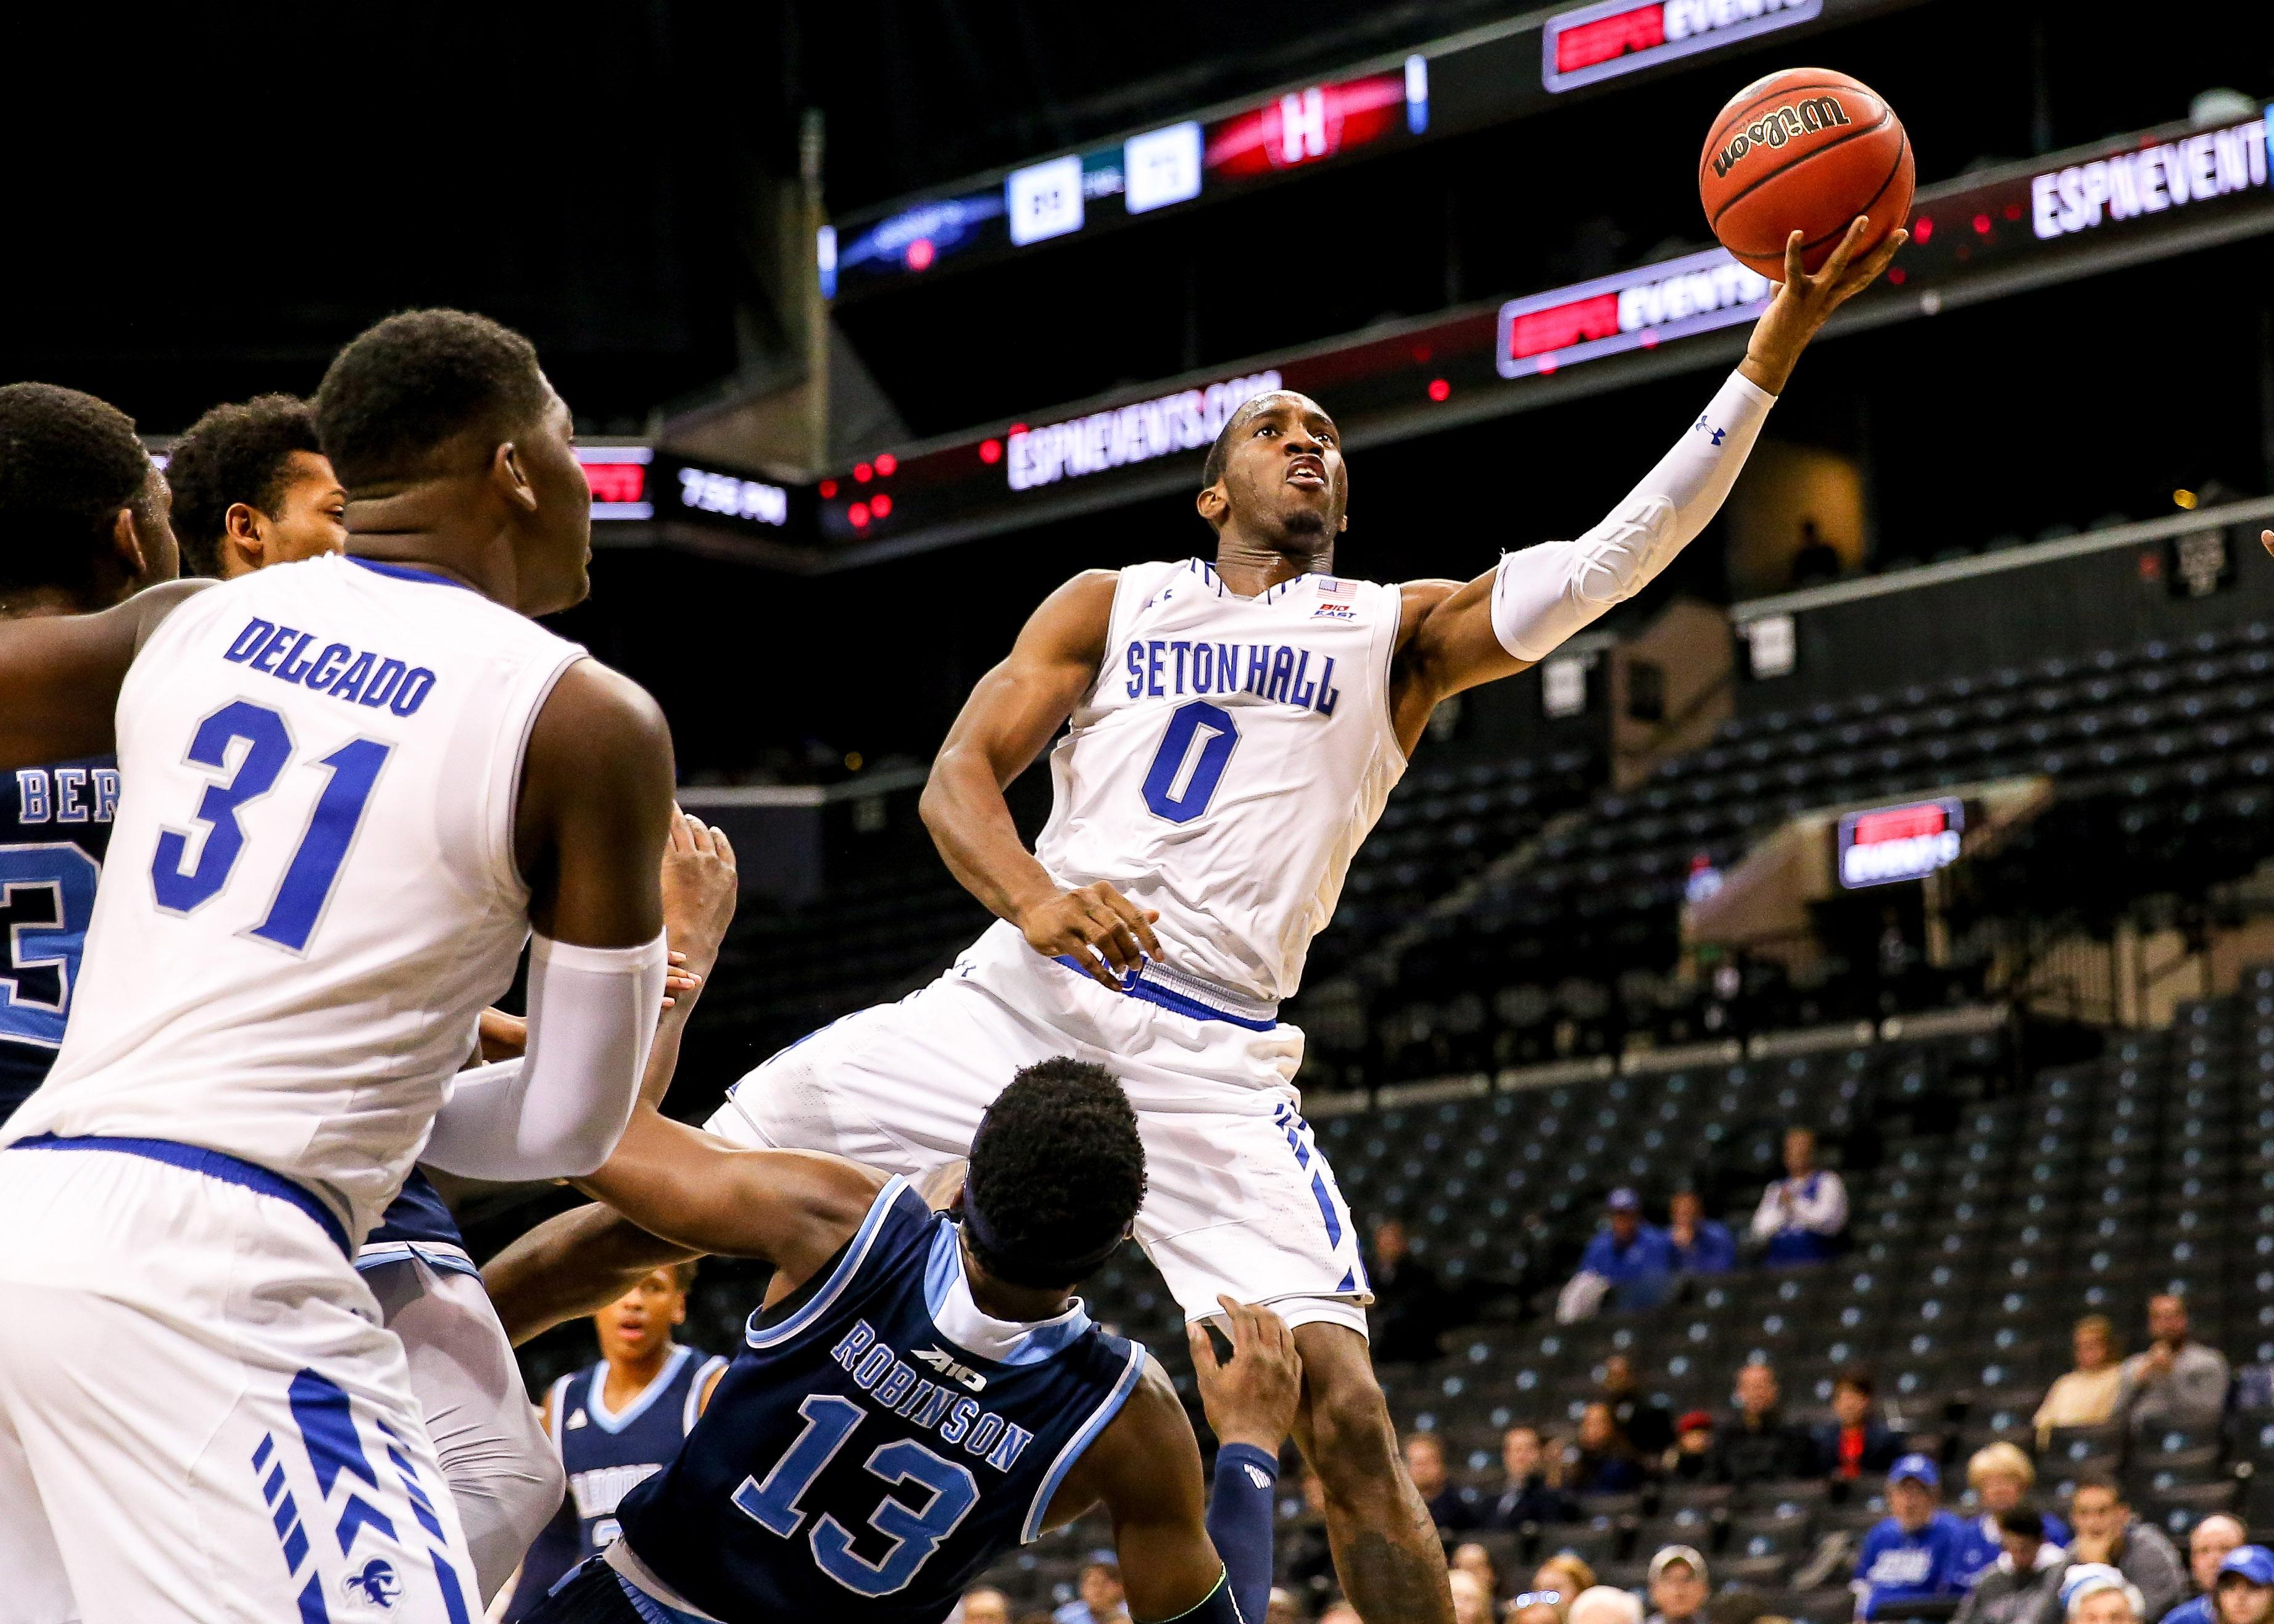 NCAA Basketball: NIT Season Tip-Off-Seton Hall vs Rhode Island